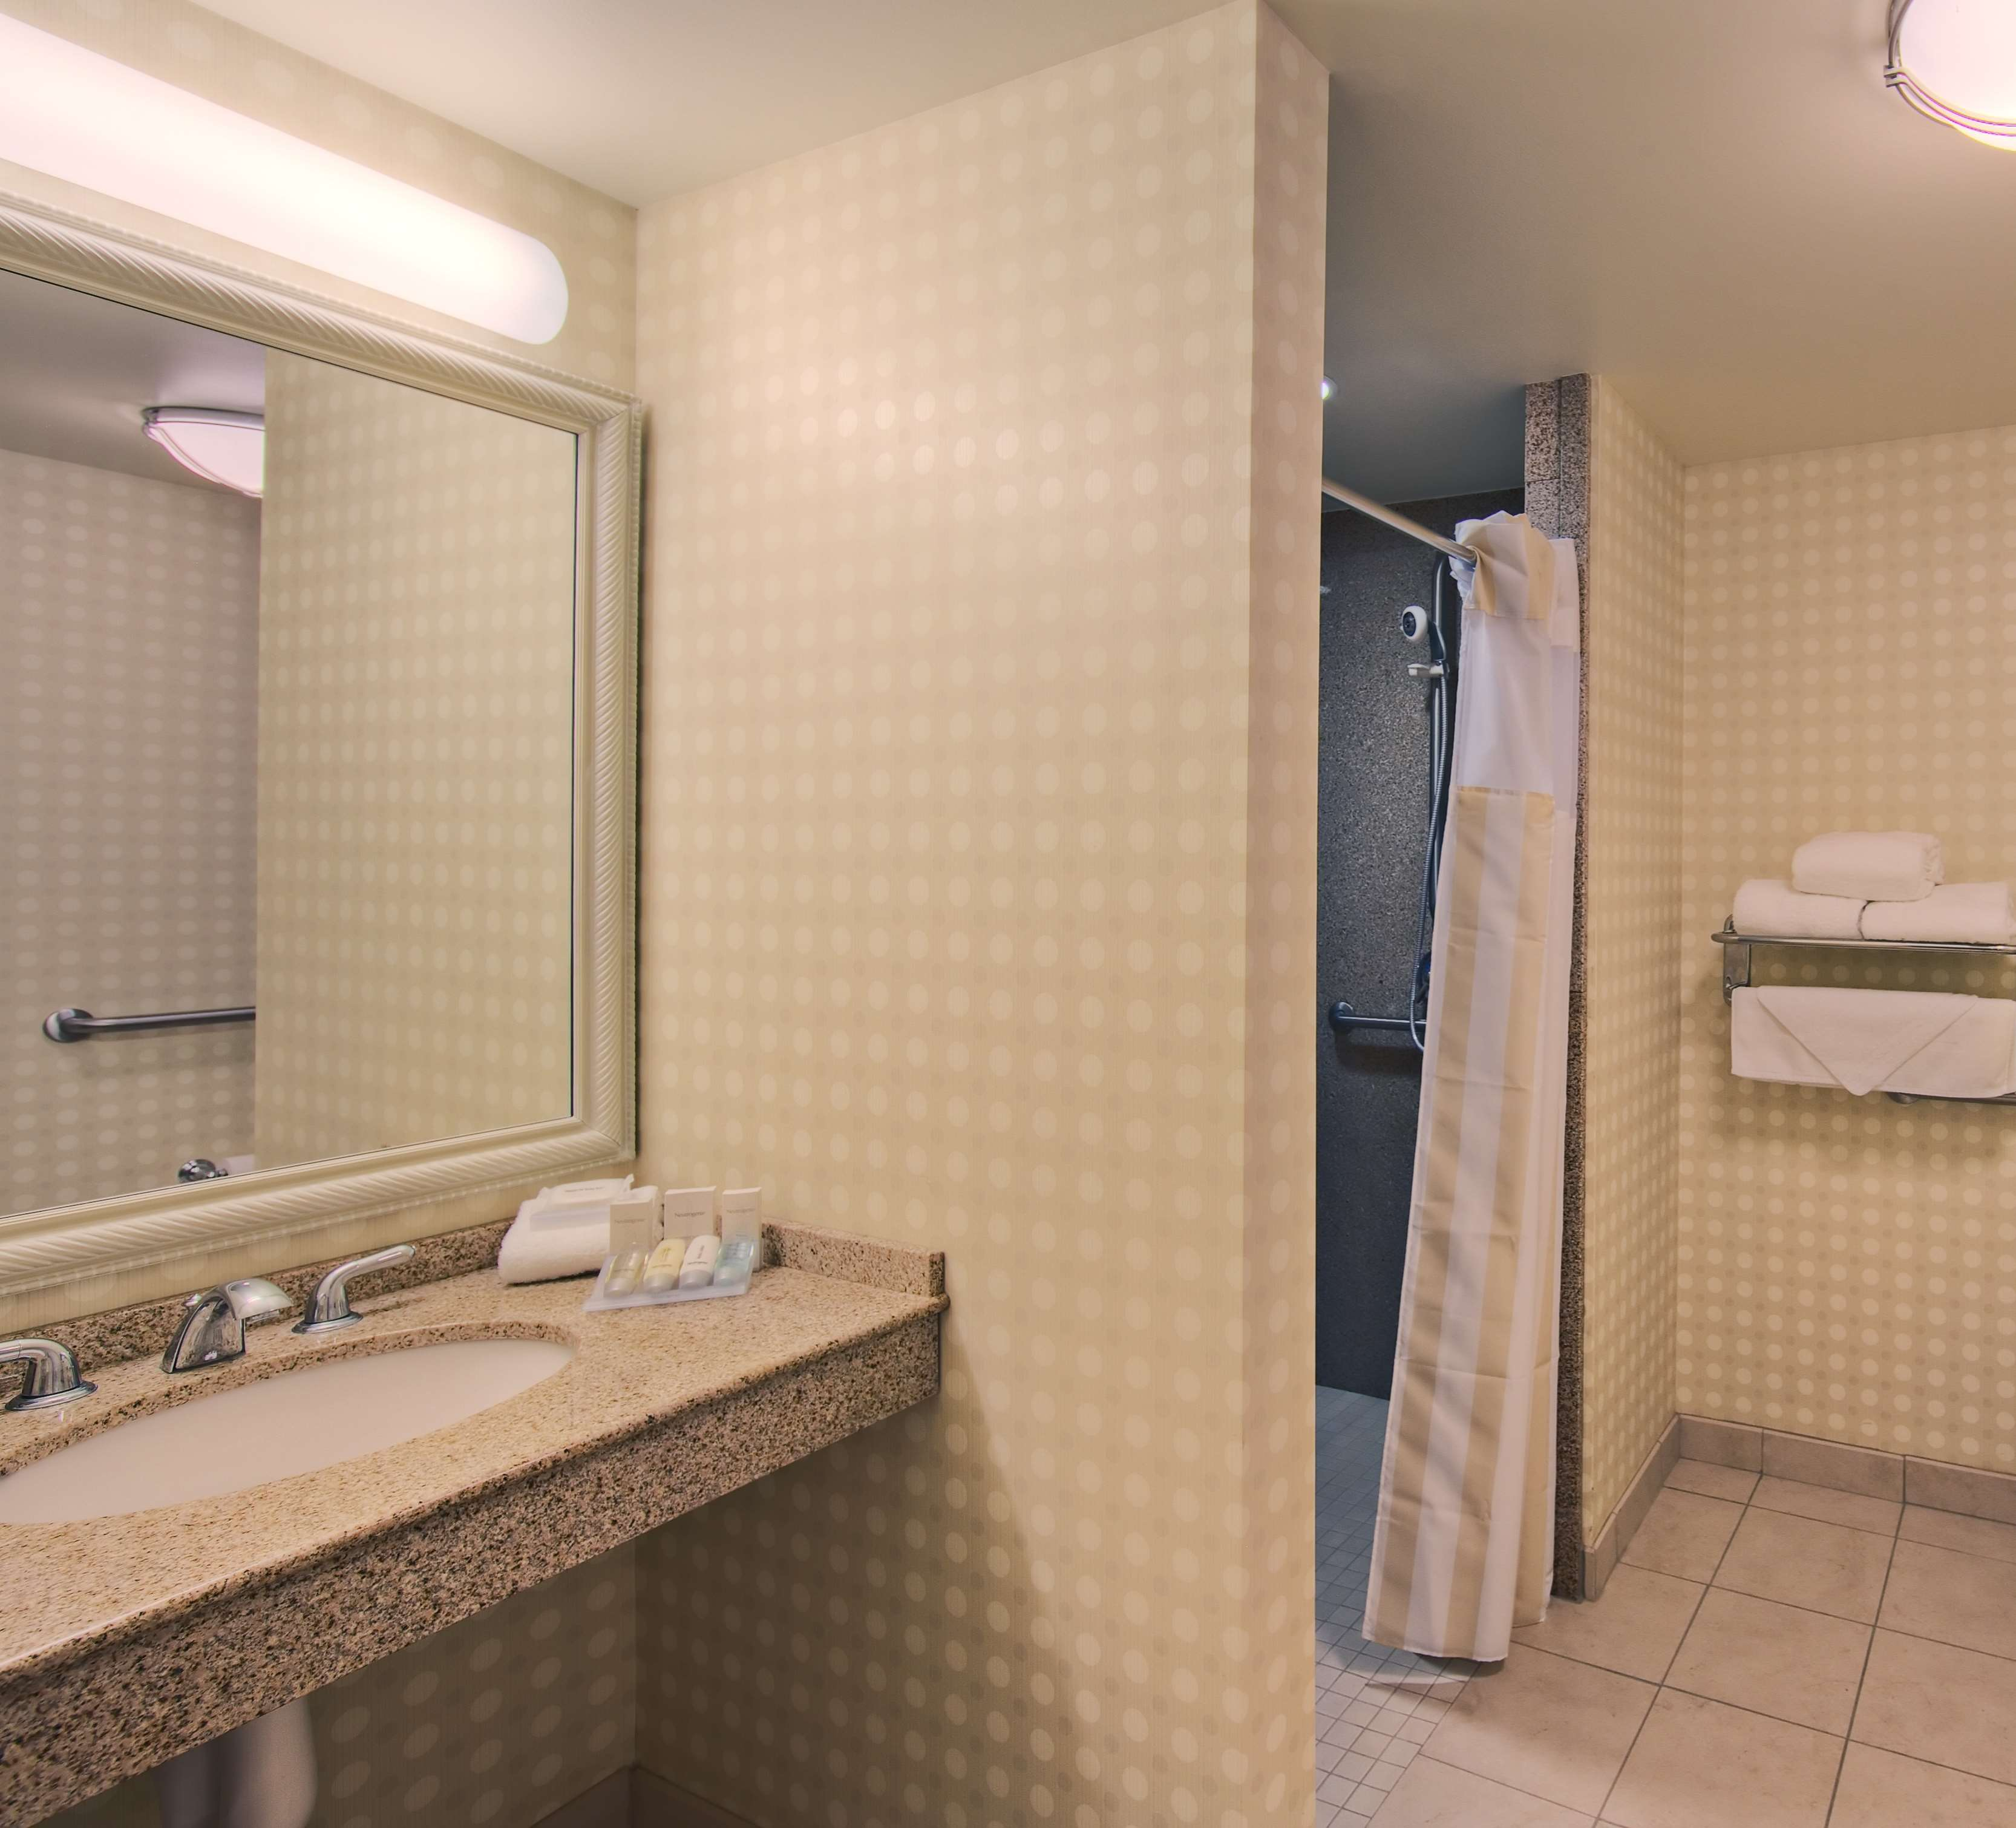 Hilton Garden Inn Laramie image 31